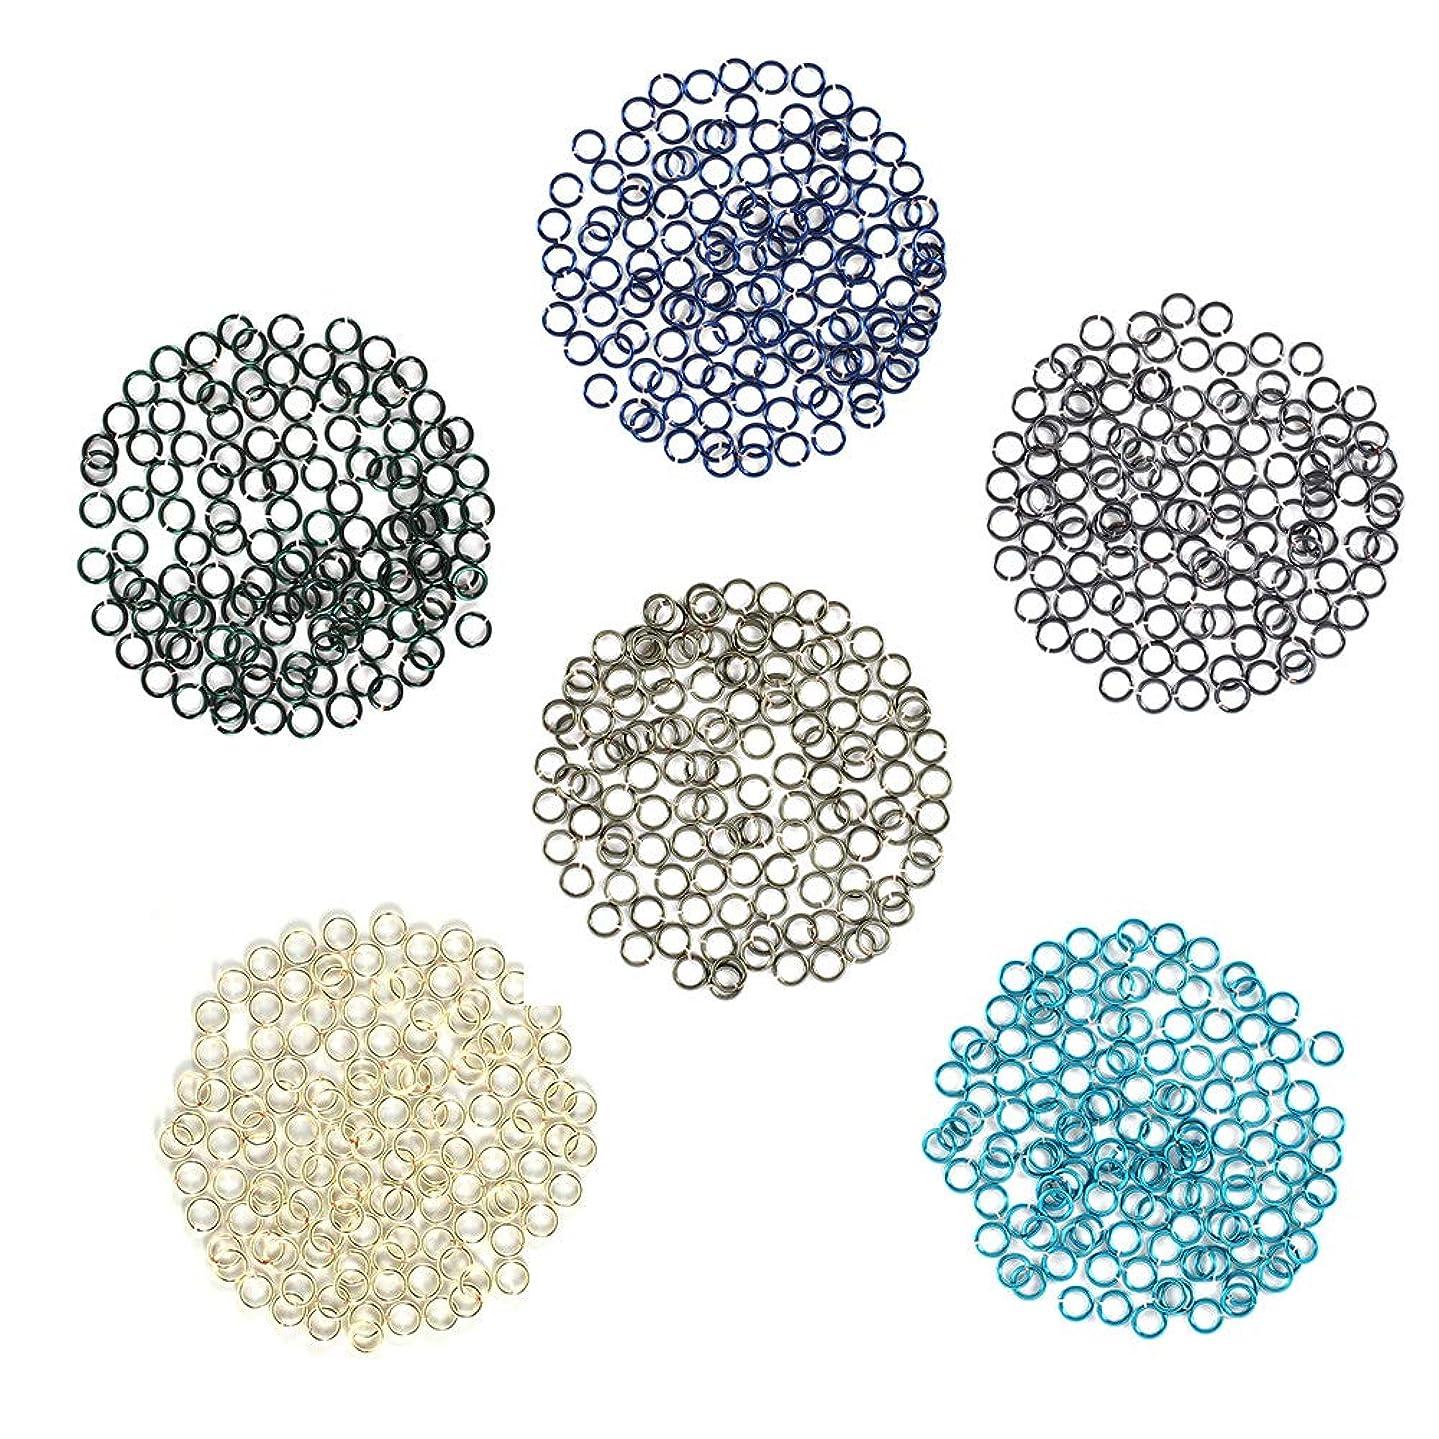 Cold and Dark - Enameled Copper Jump Rings – 22 Gauge – 4.0mm ID - 600 Rings - Blue, Blue Steel, Hematite, Pacific Blue, Silver, Teal